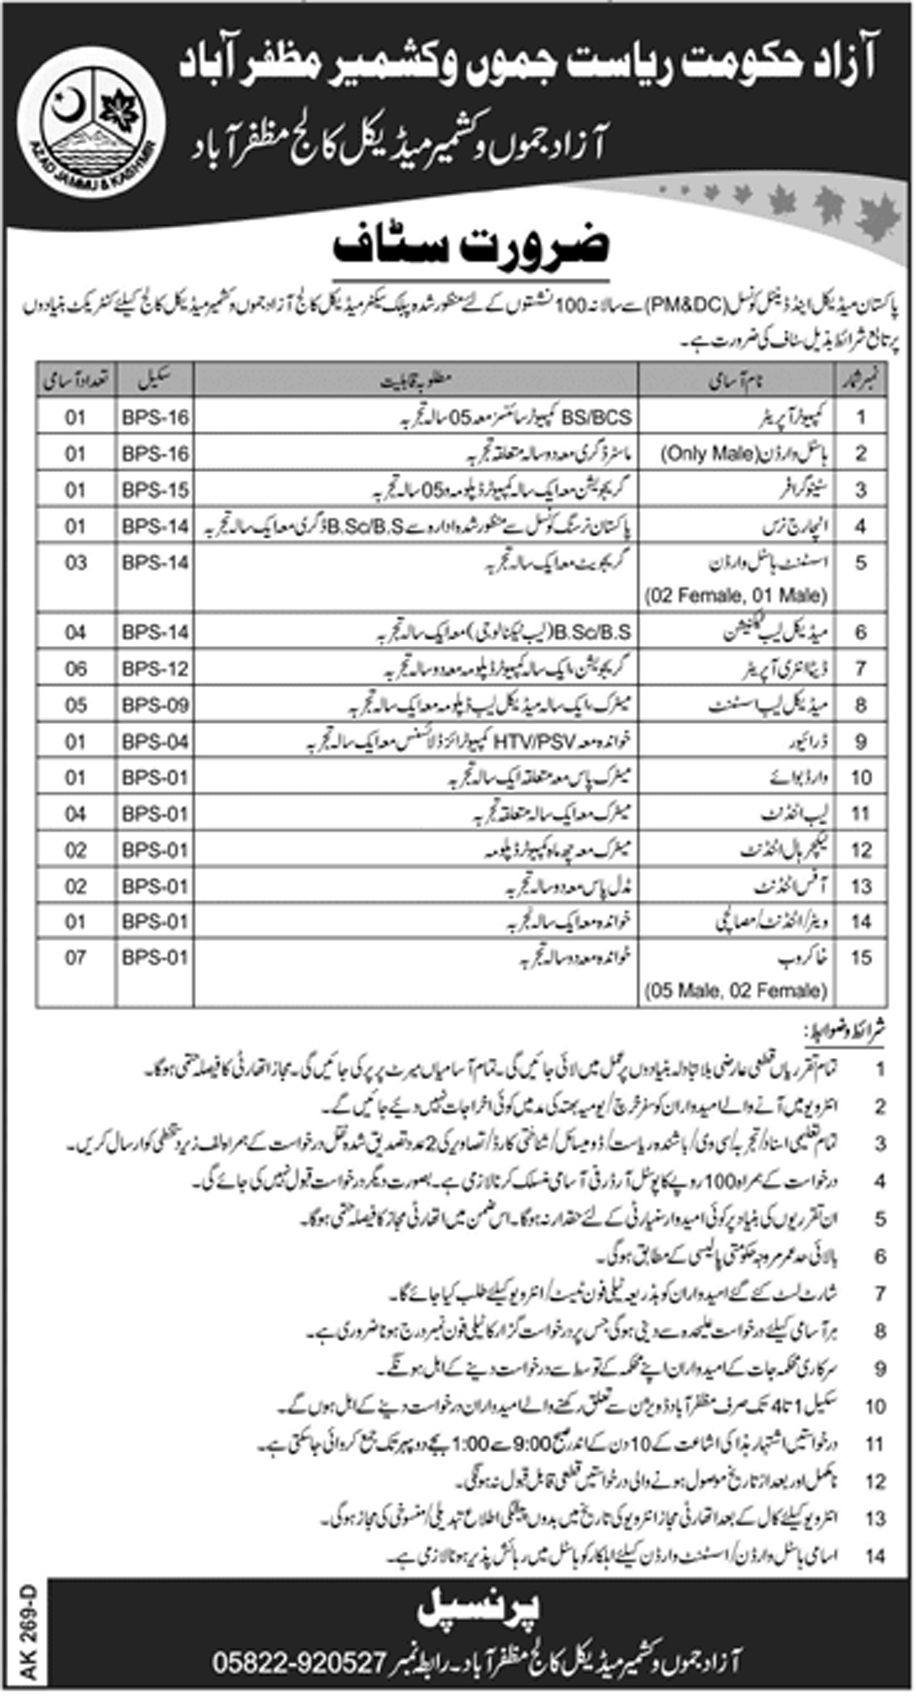 Medical College Azad Jammu & Kashmir (AJK) 40 Jobs 09 February 2018 Daily Jang Newspaper